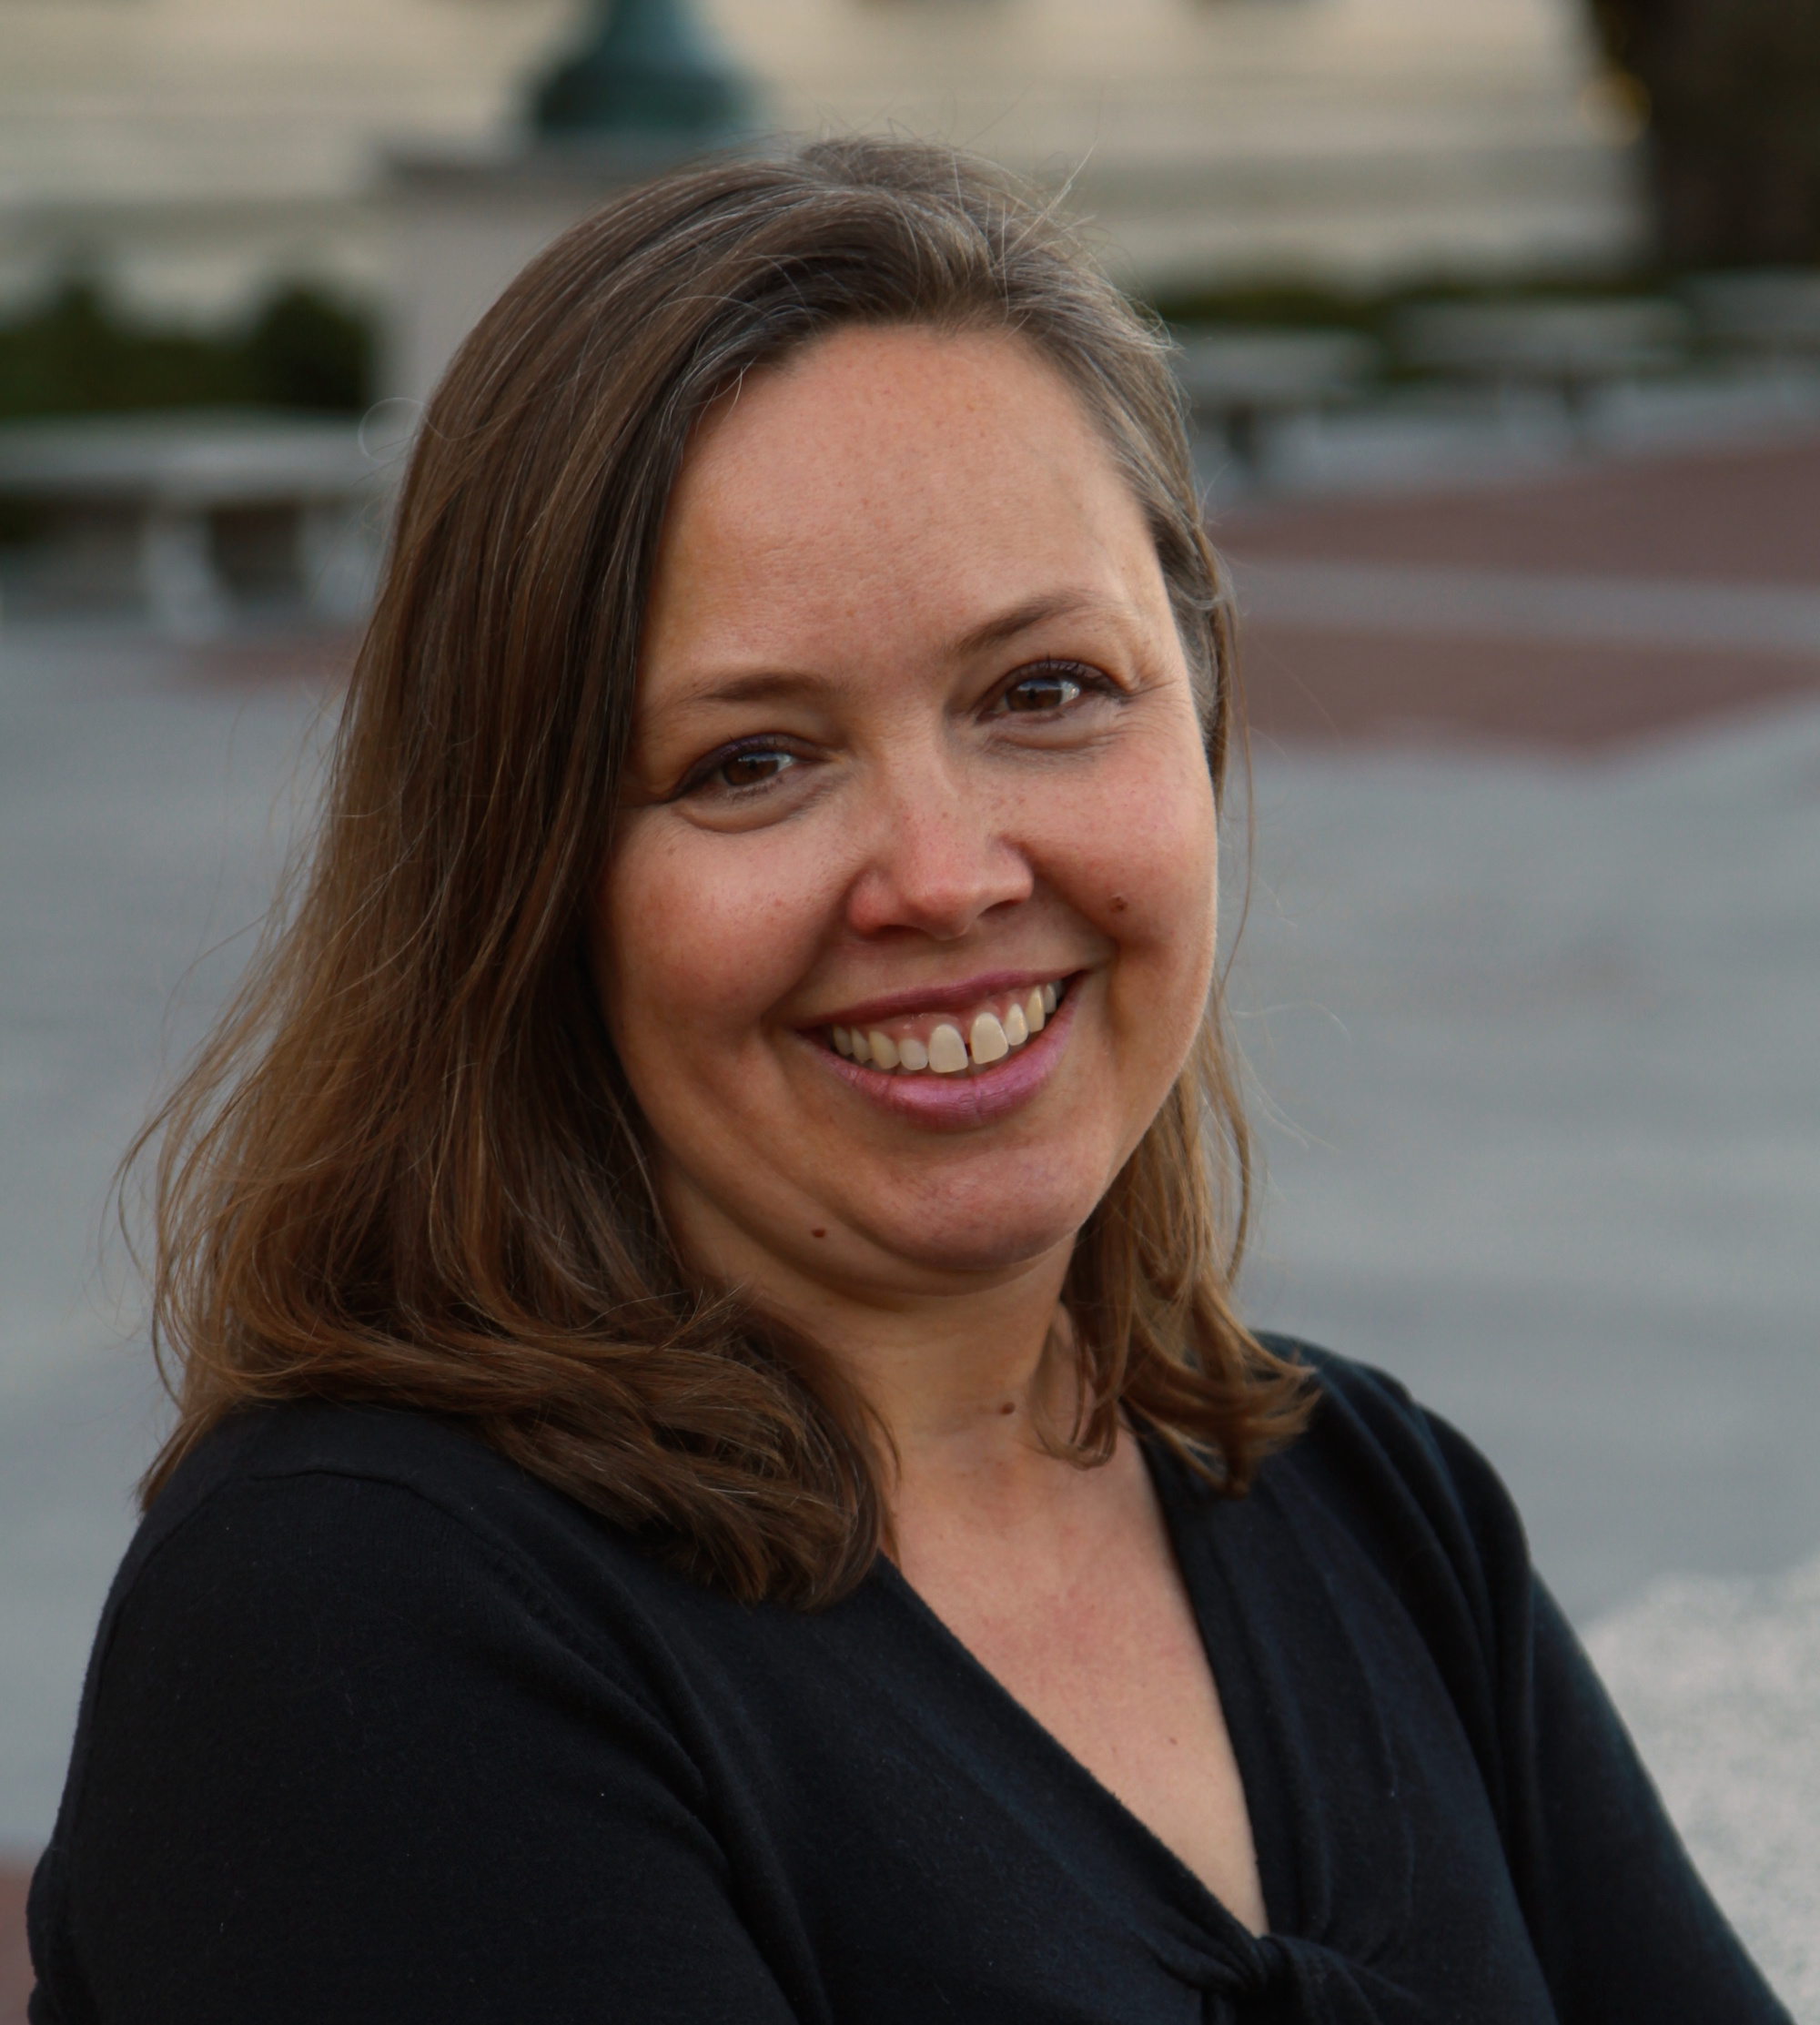 Vicki Zakrzewski